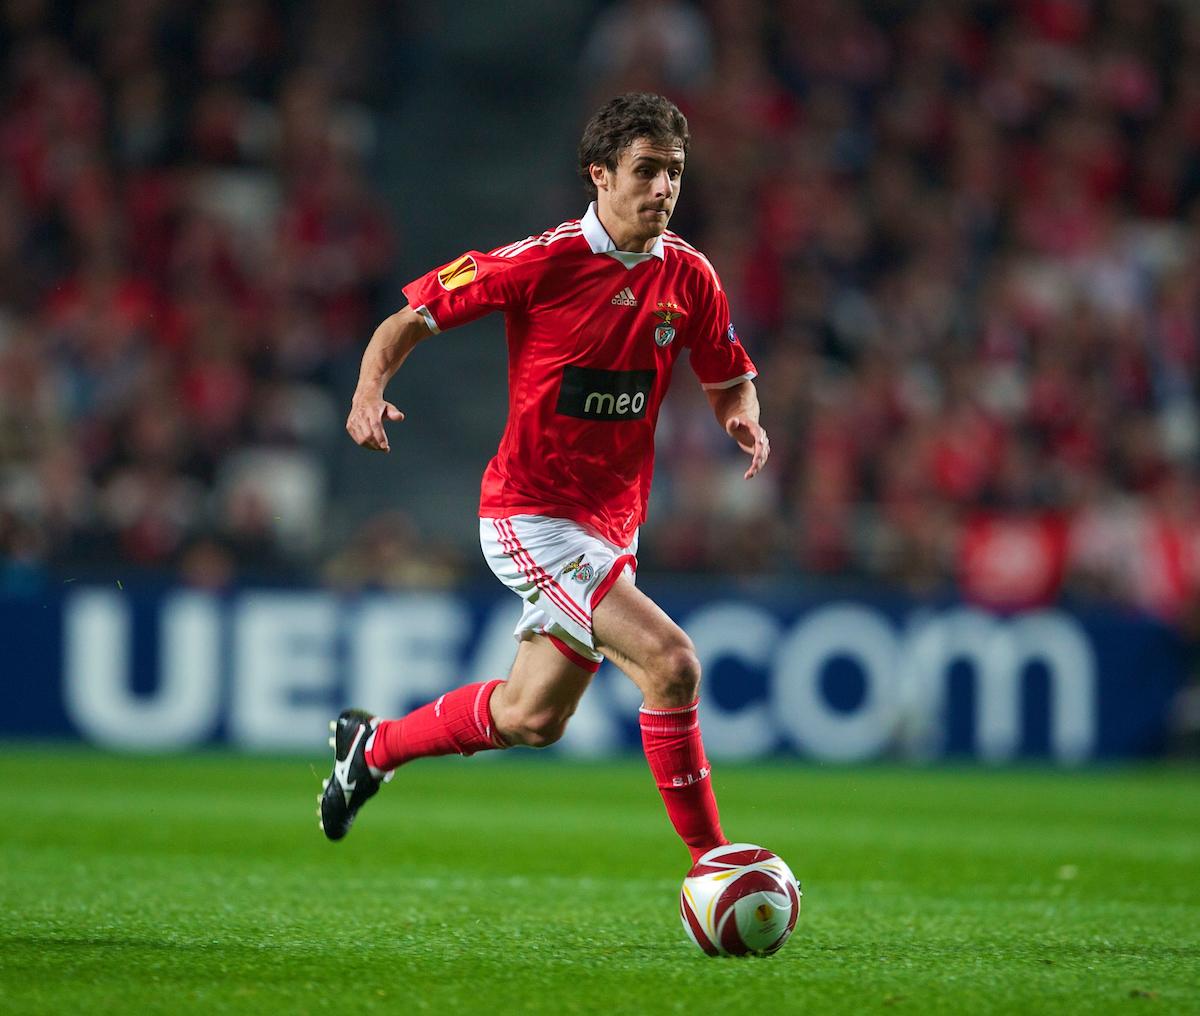 LISBON, PORTUGAL - Thursday, April 1, 2010: SL Benfica's Pablo Aimar during the UEFA Europa League Quarter-Final 1st Leg match Liverpool at the Estadio da Luz. (Pic by David Rawcliffe/Propaganda)